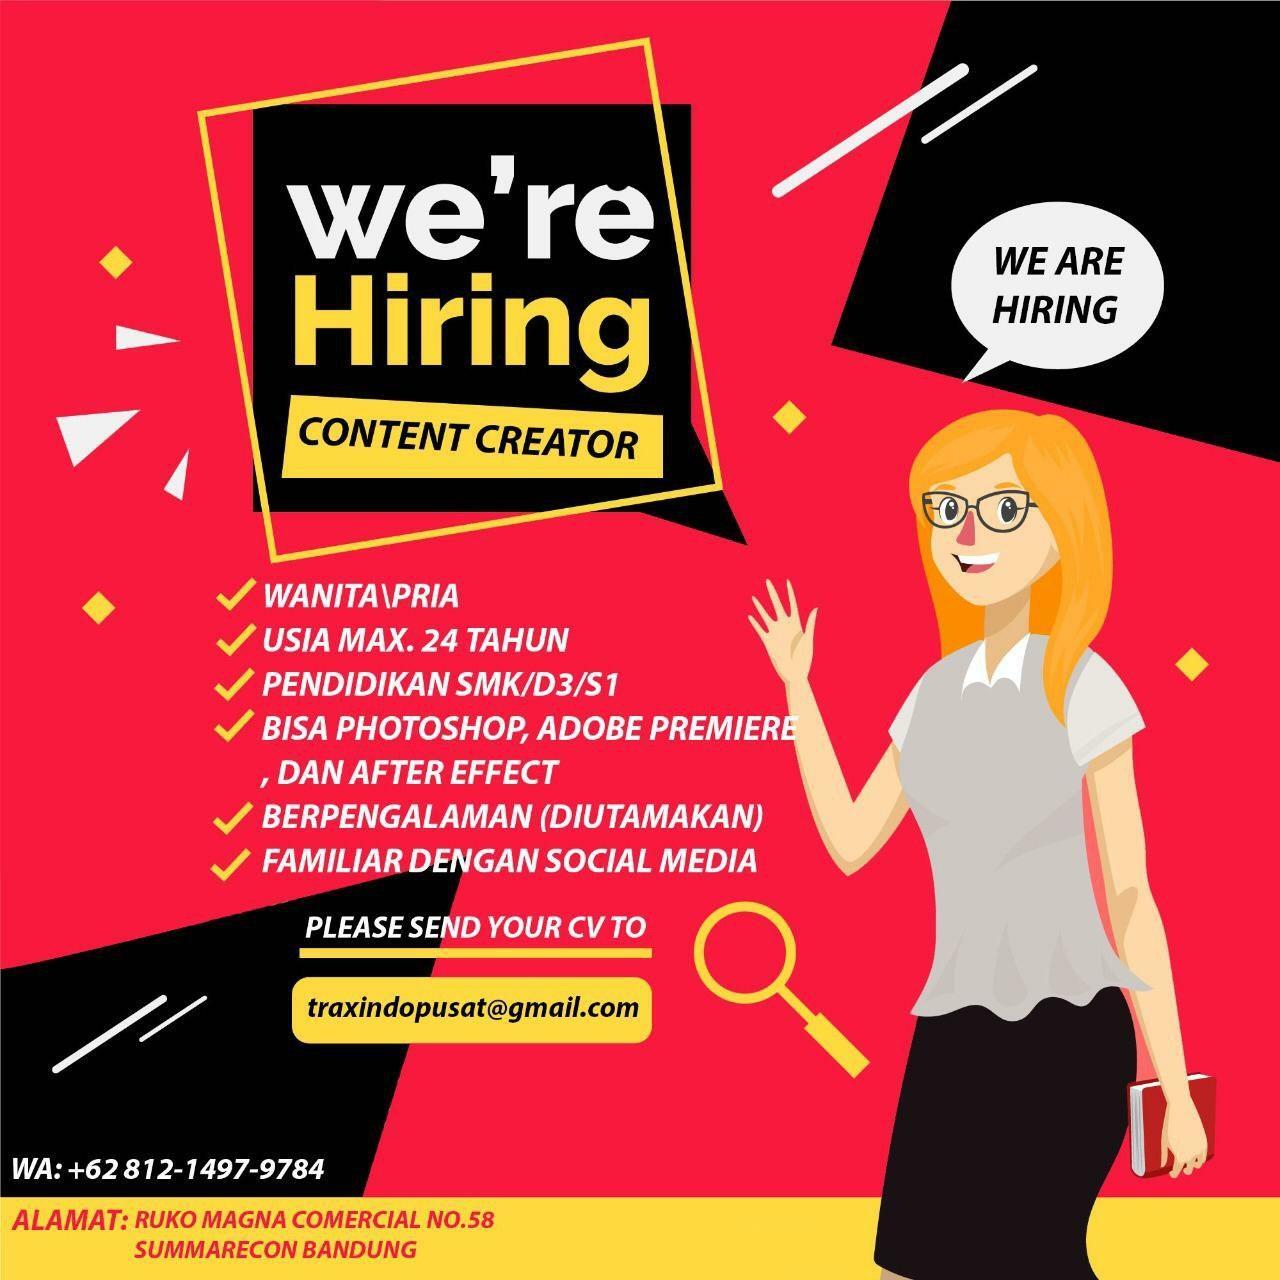 Lowongan Kerja Content Creator Traxindo Bandung Januari 2020